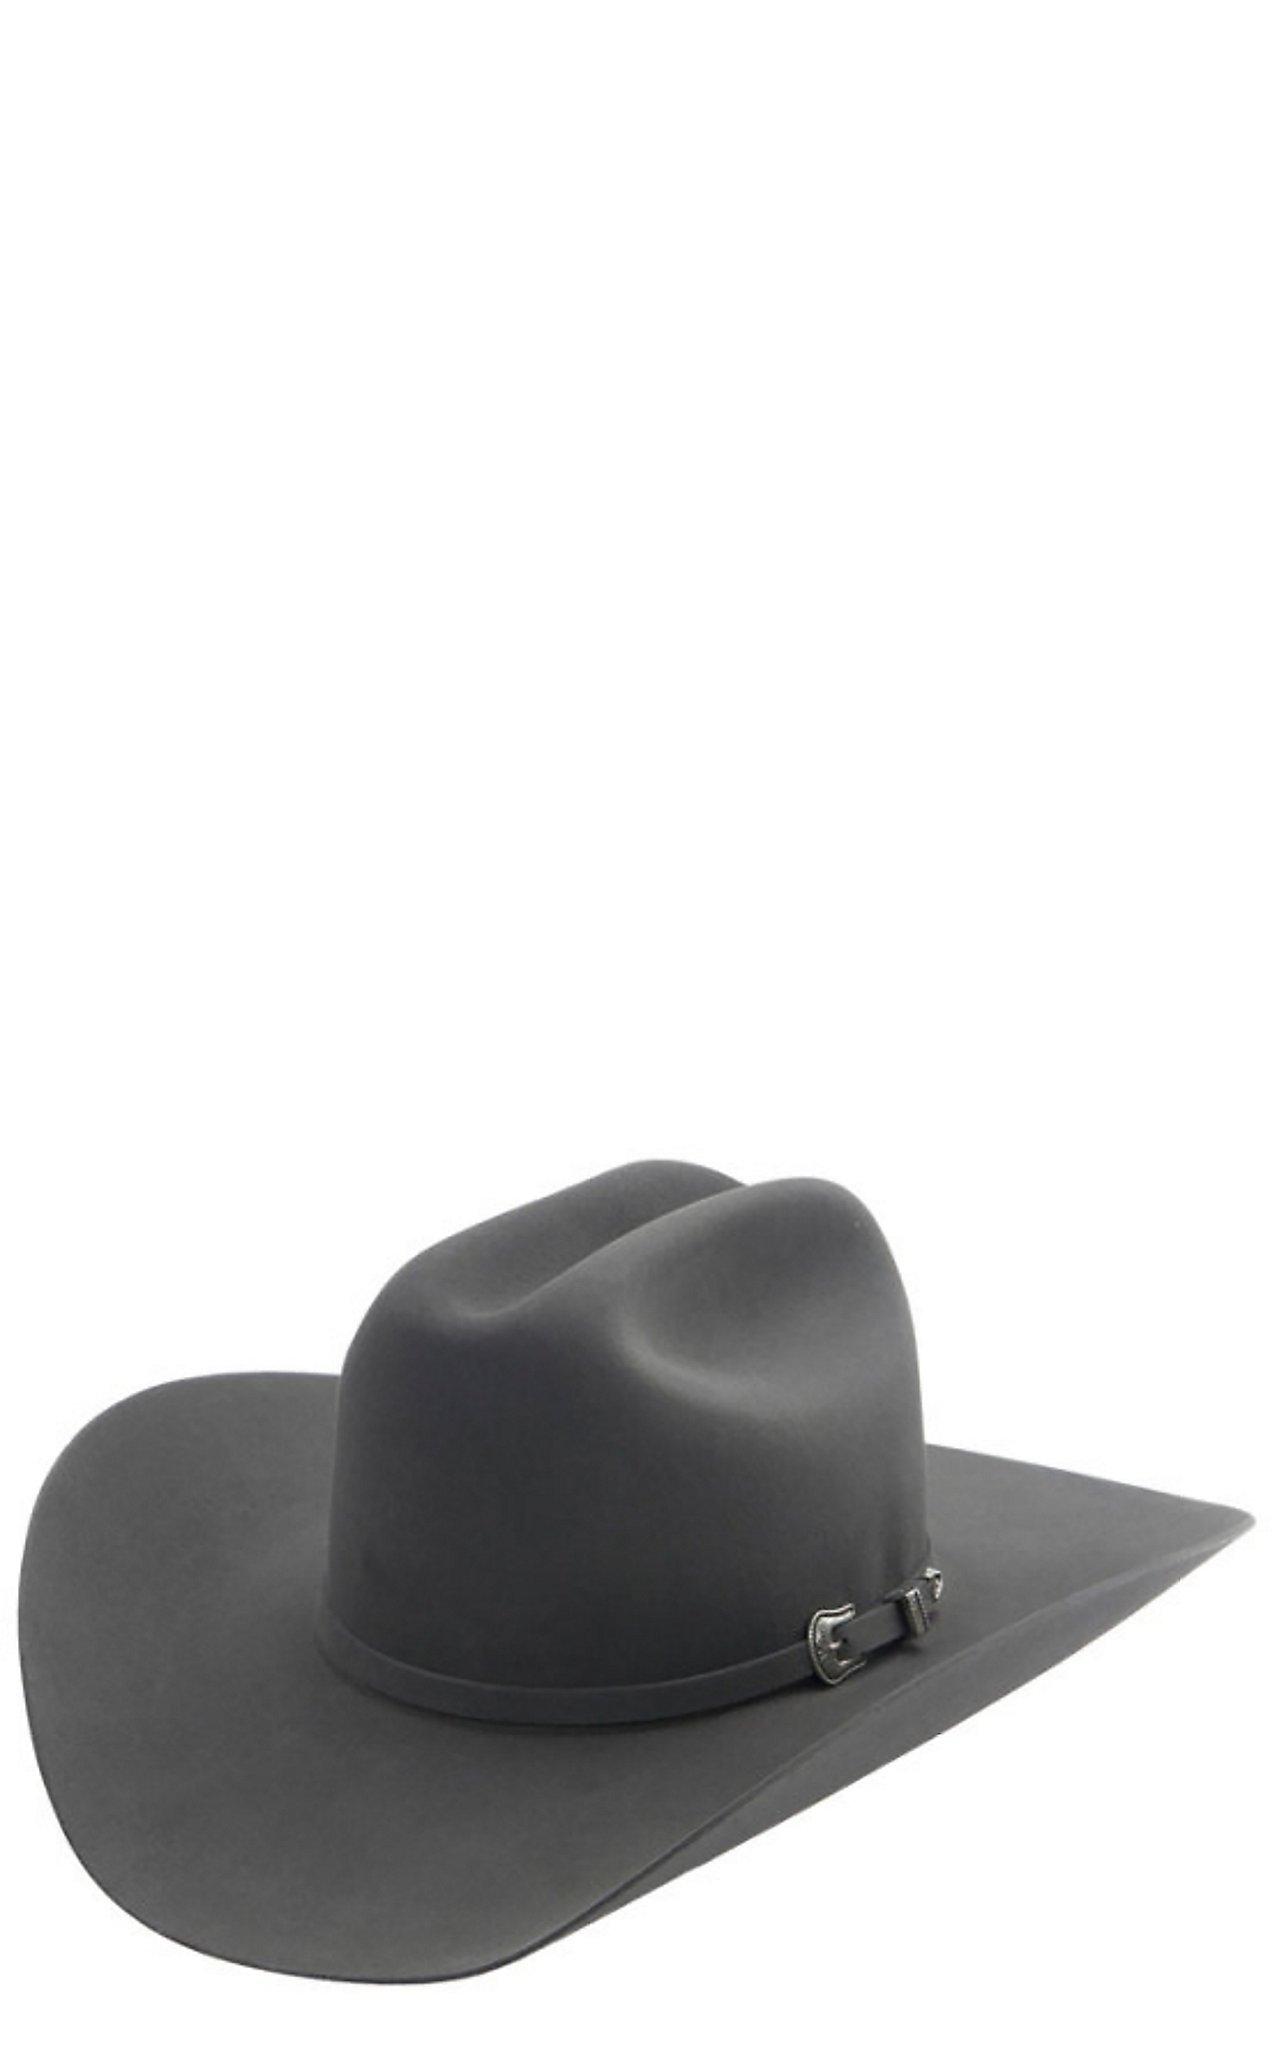 Resistol 5X The Challenger Granite Grey Cattlemen Felt Cowboy Hat 882a8aedb667